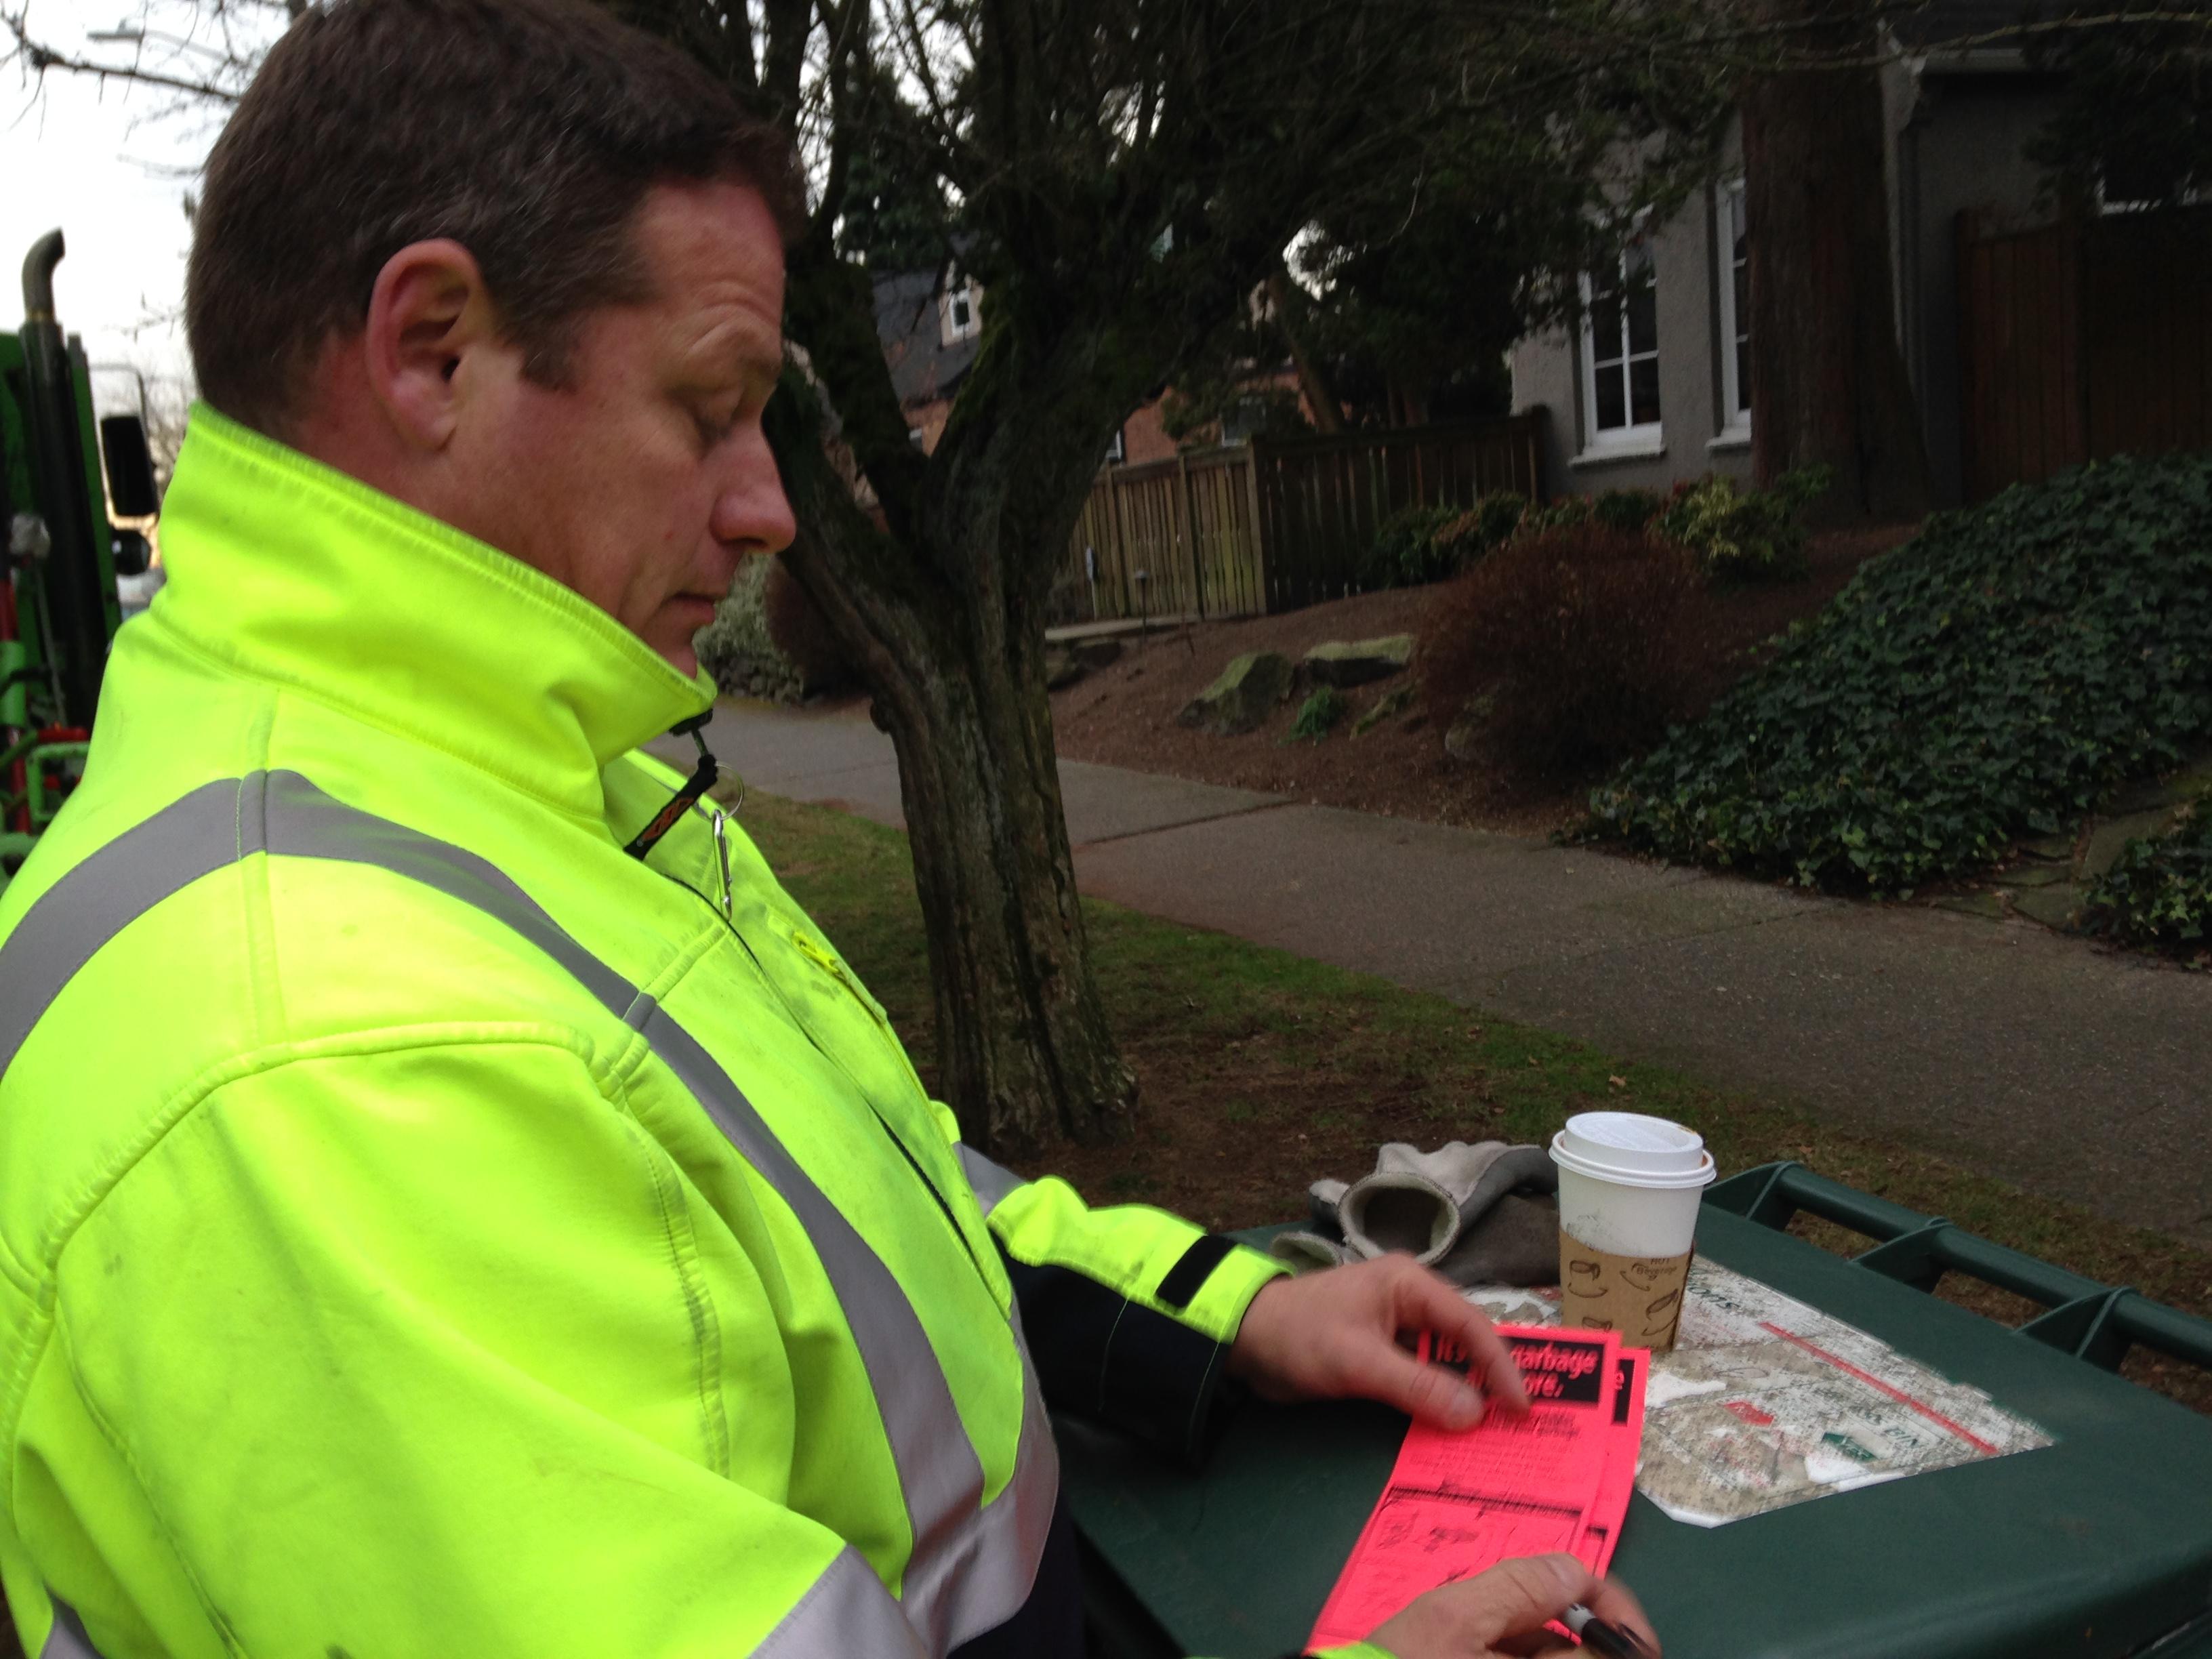 Seattle s Scarlet Letter For Sloppy Trash Sorters